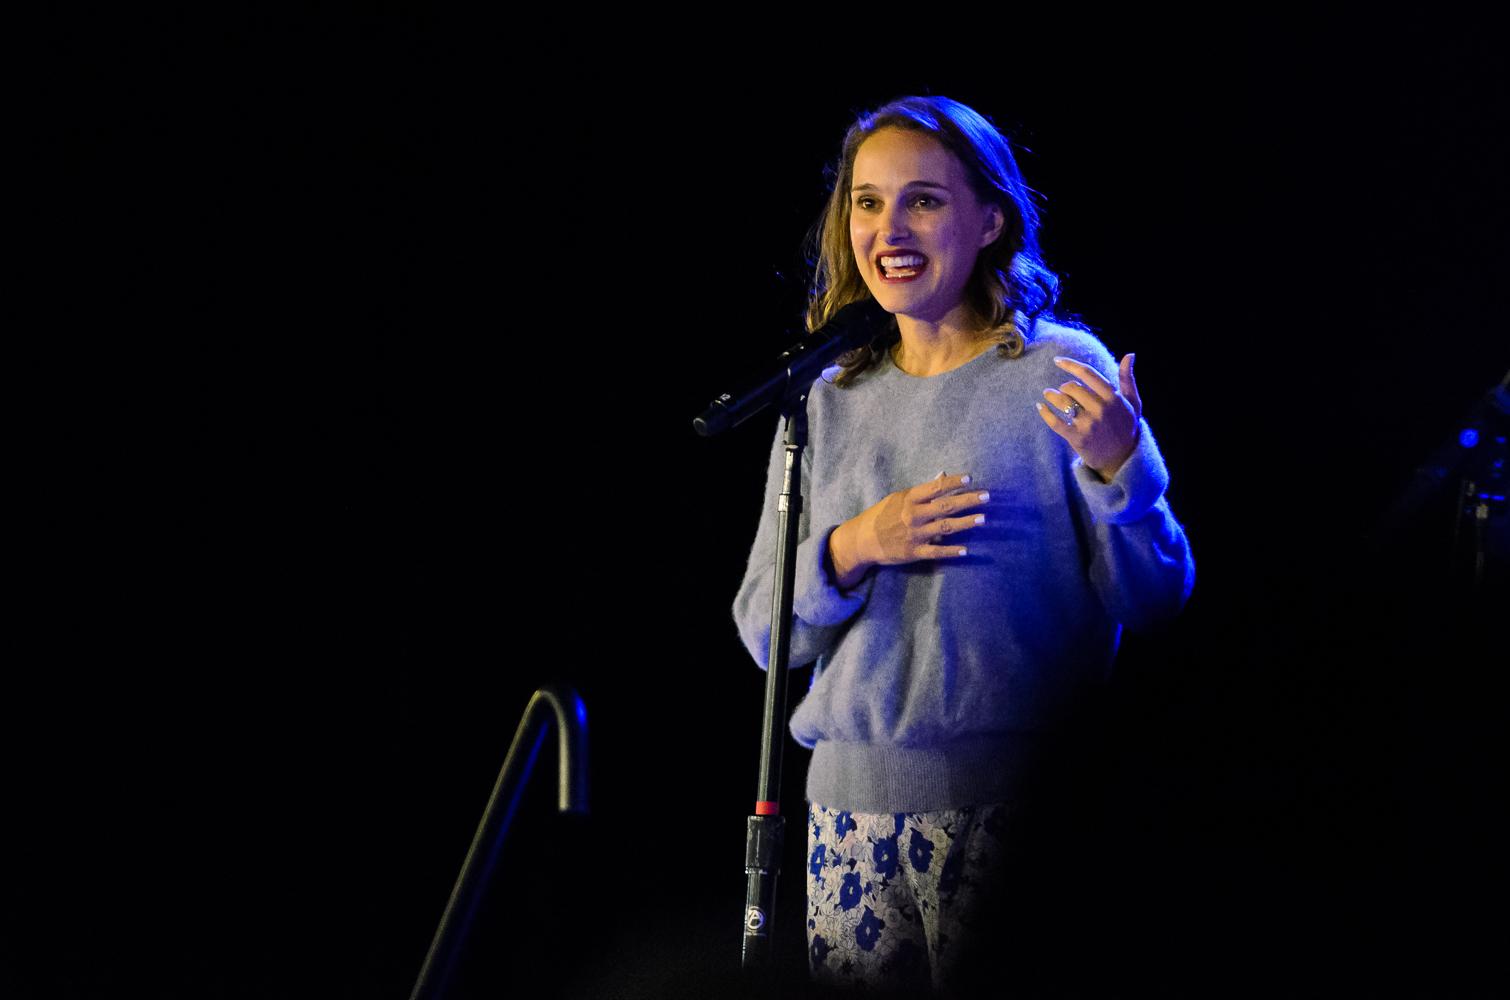 Natalie Portman, photo by Ben Kaye